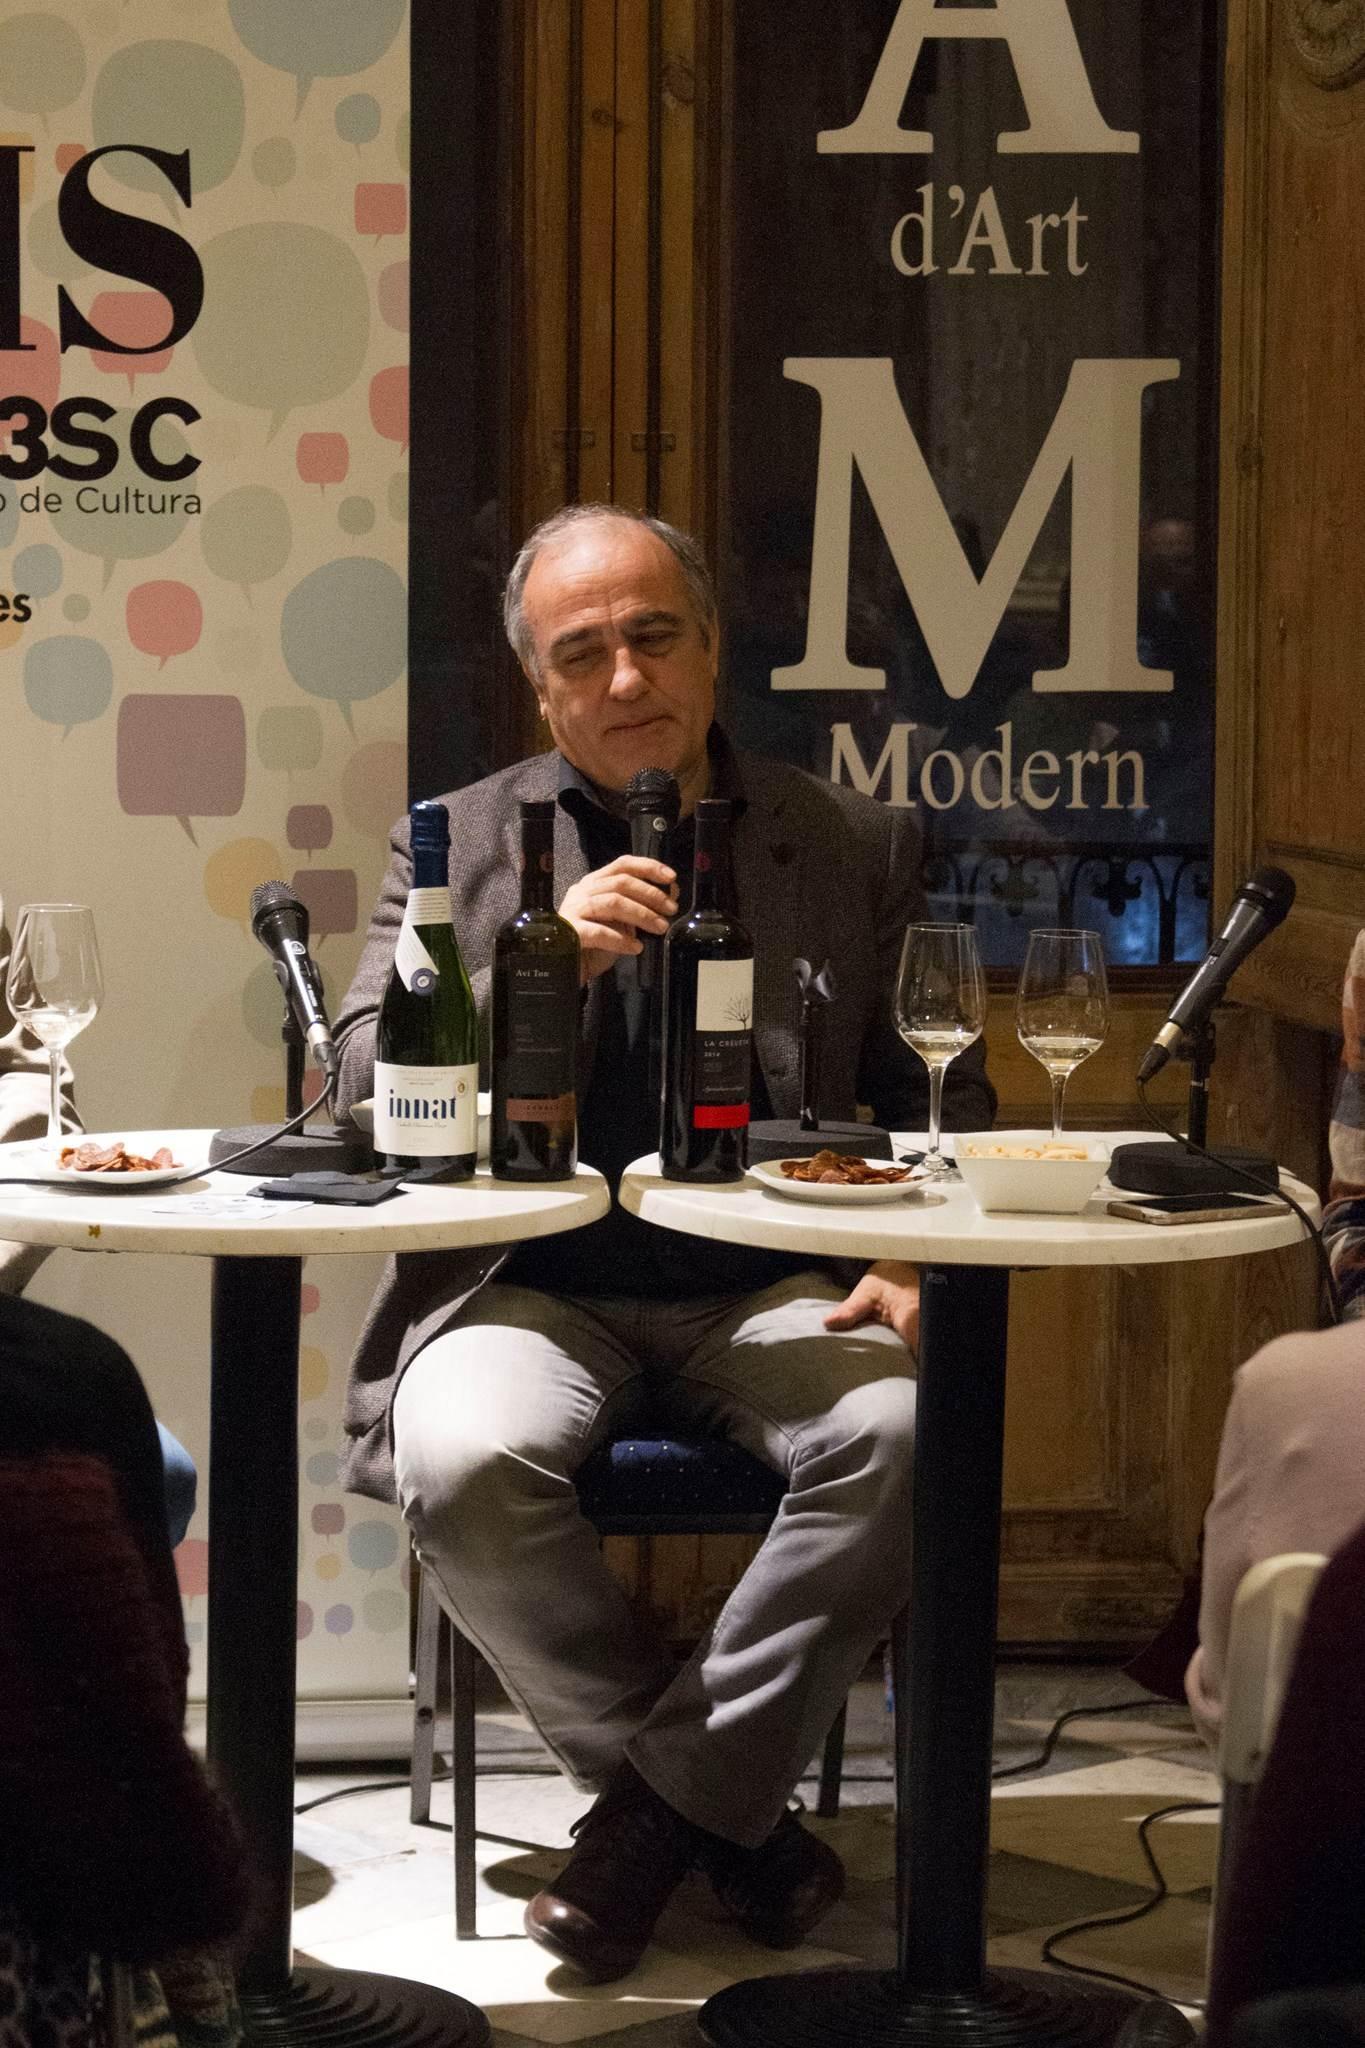 #VisàVis amb Francesc Orella i el celler Eudald Massana Noya